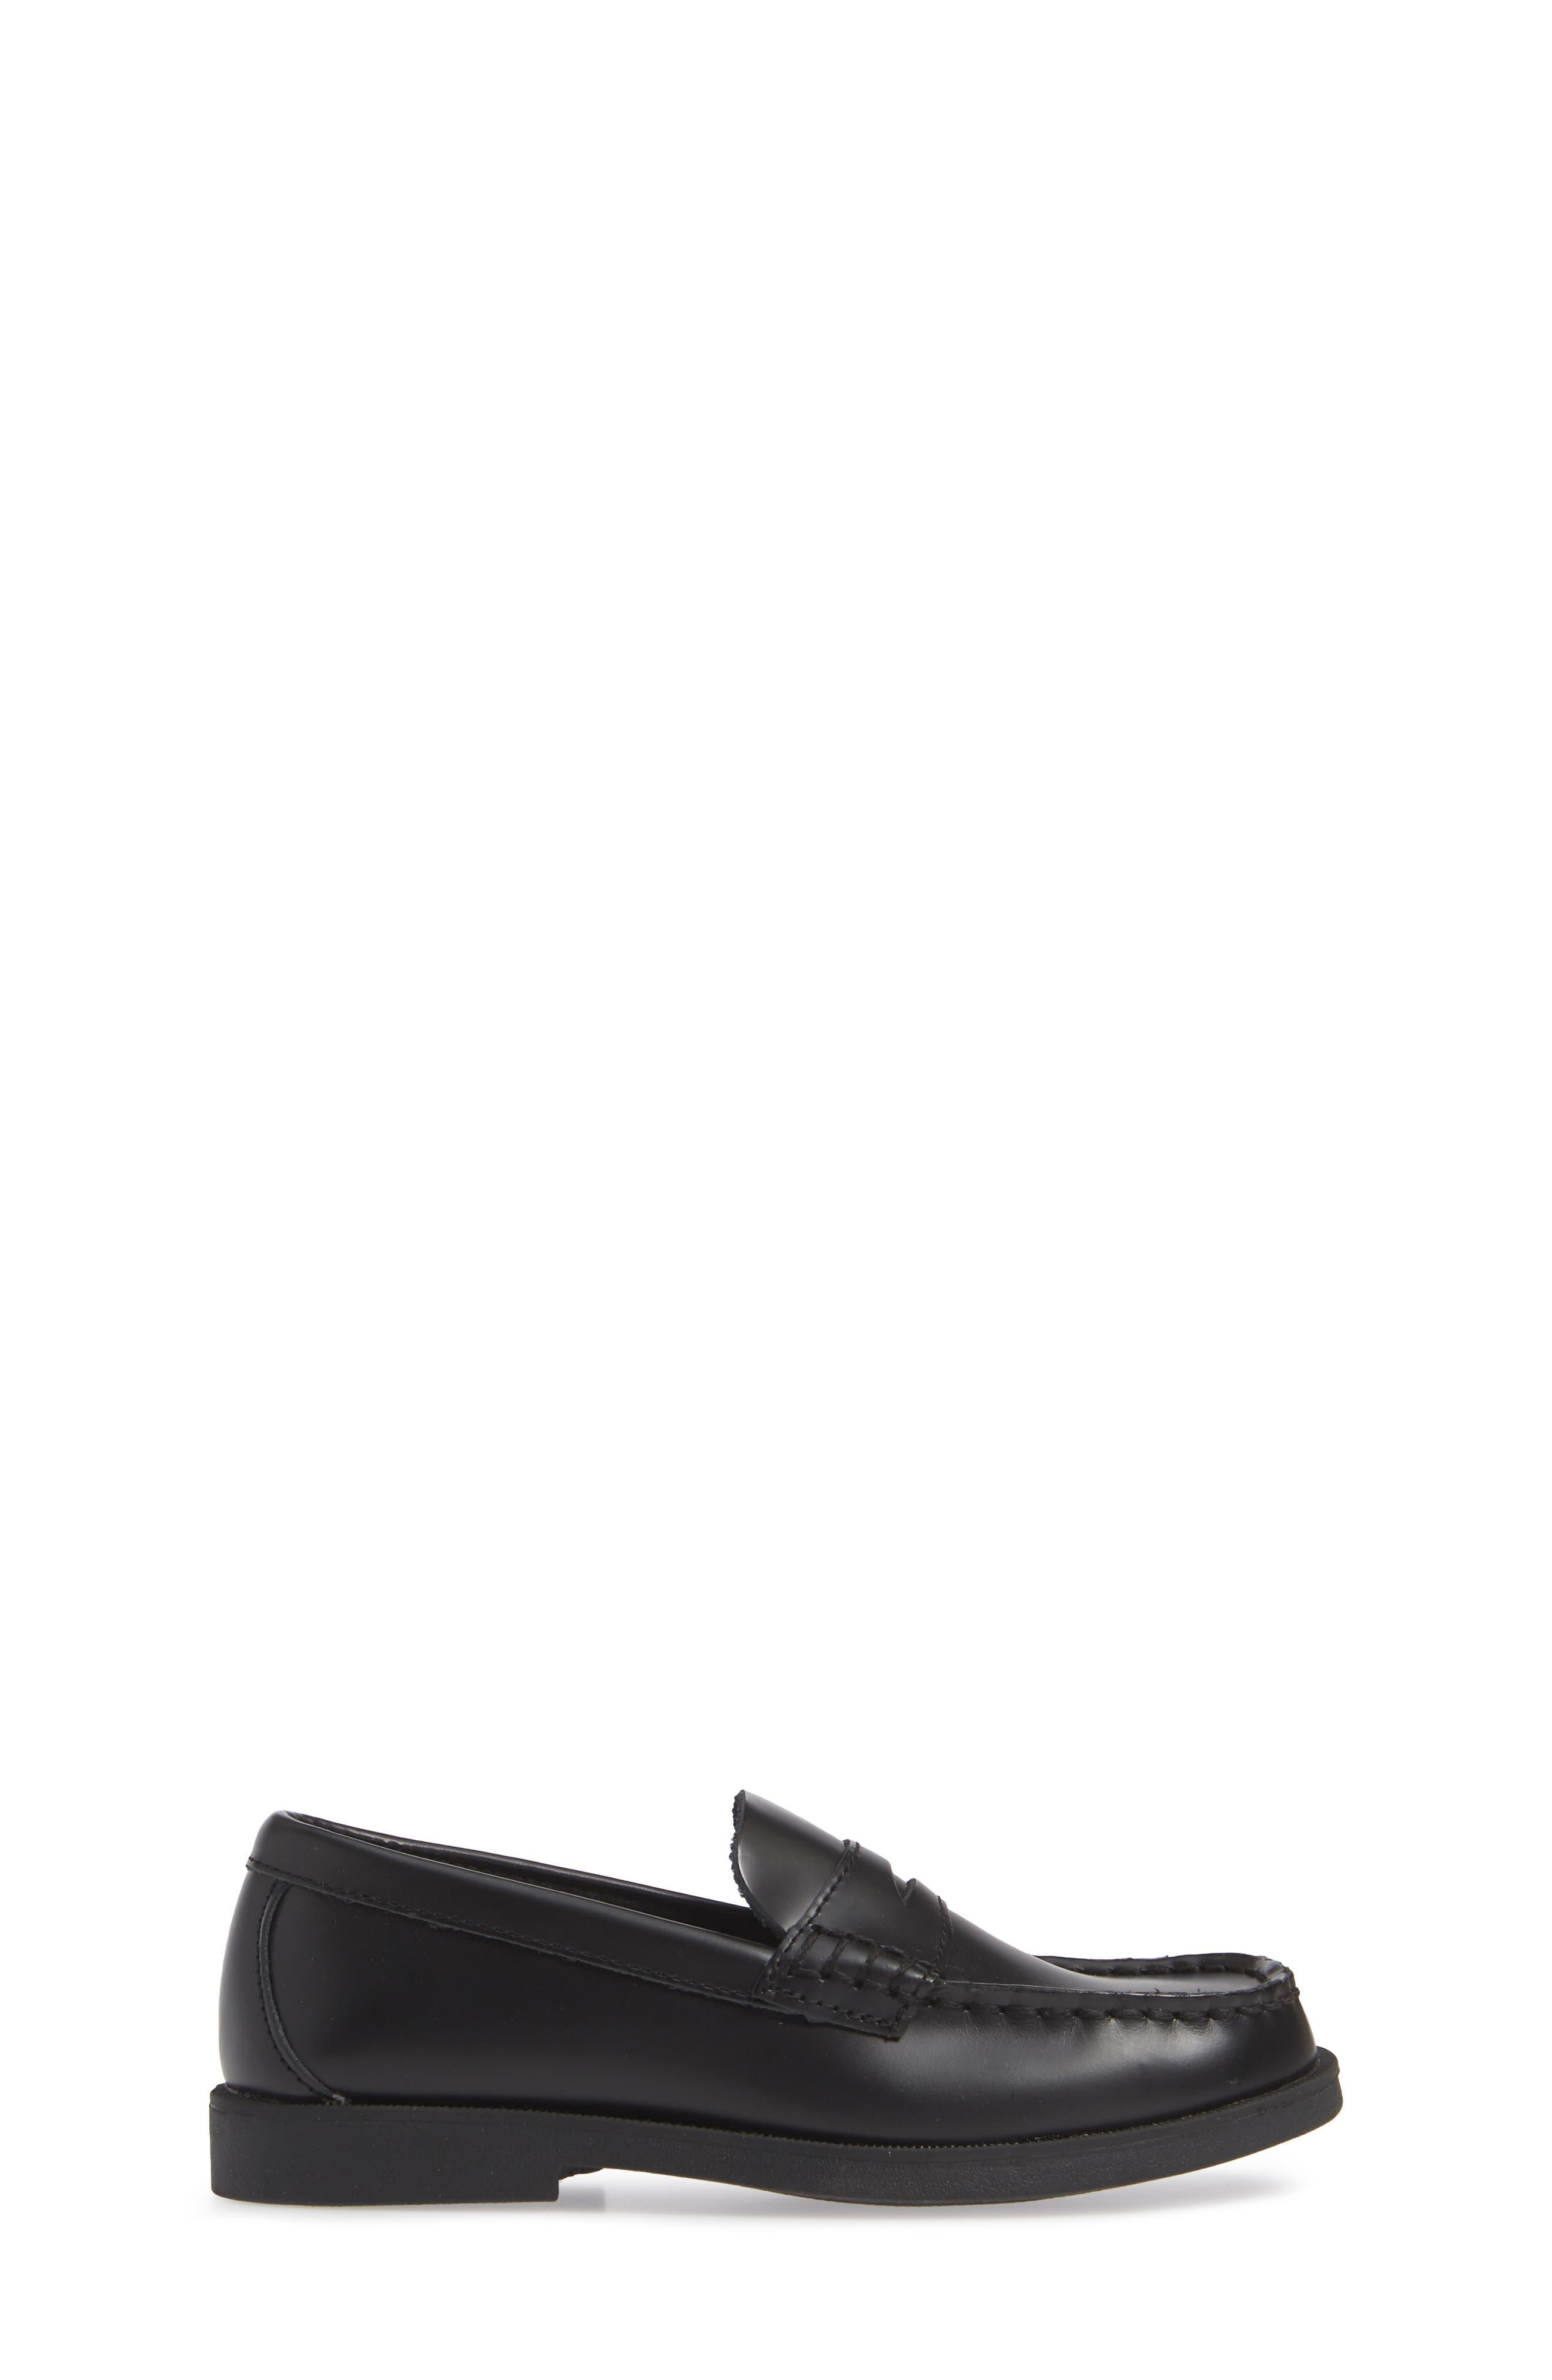 'Colton' Loafer,                             Alternate thumbnail 4, color,                             BLACK LEATHER